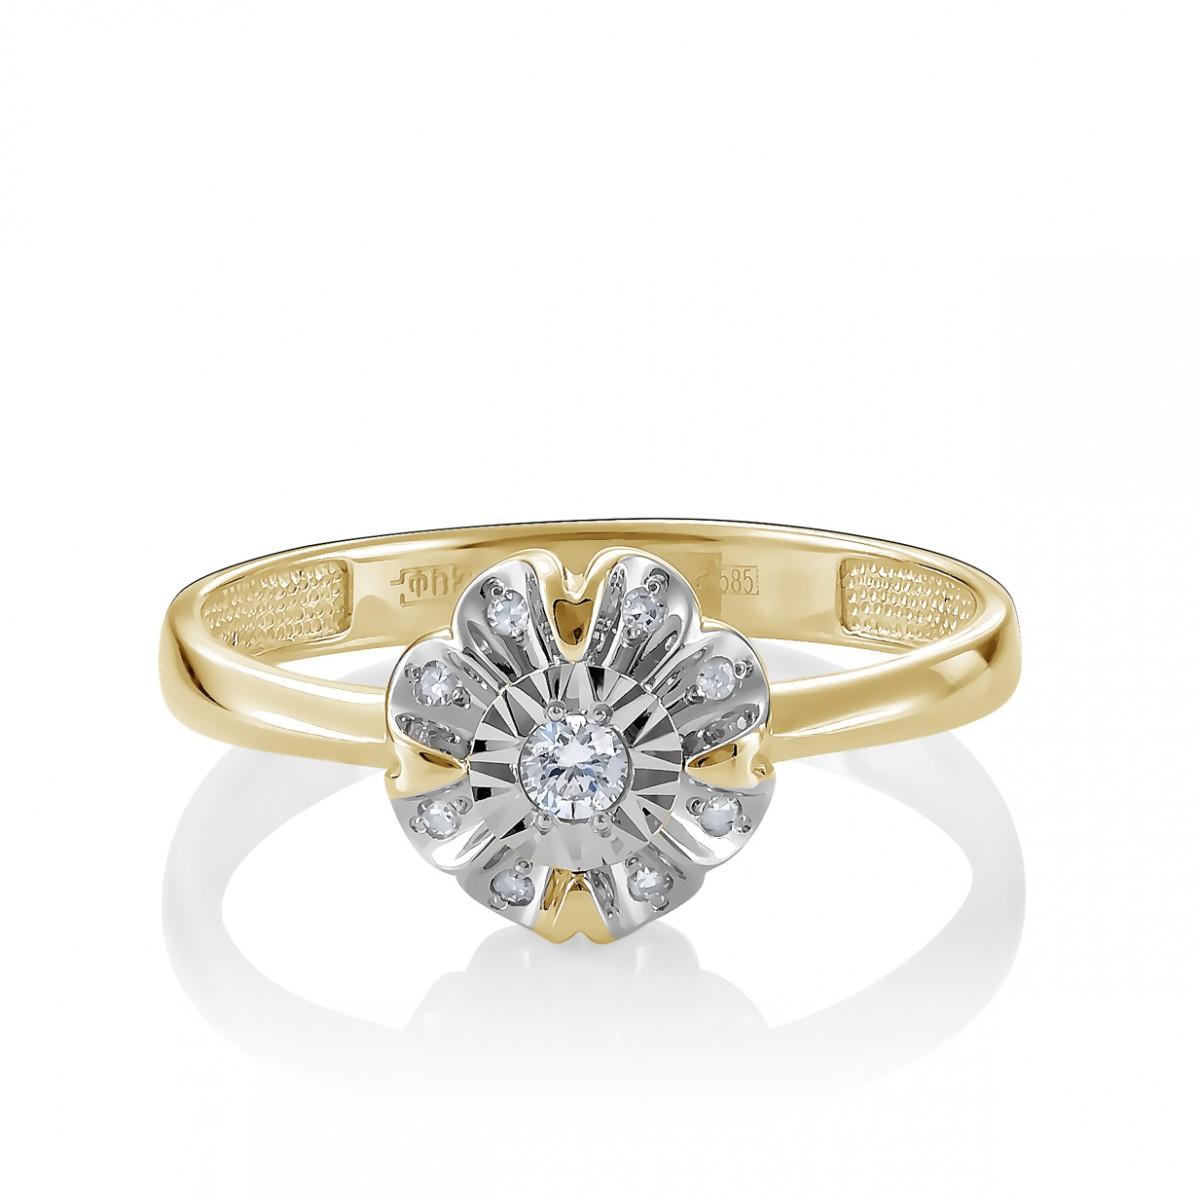 Кольцо из лимонного золота Бриллиант арт. 11-21280-1000 11-21280-1000